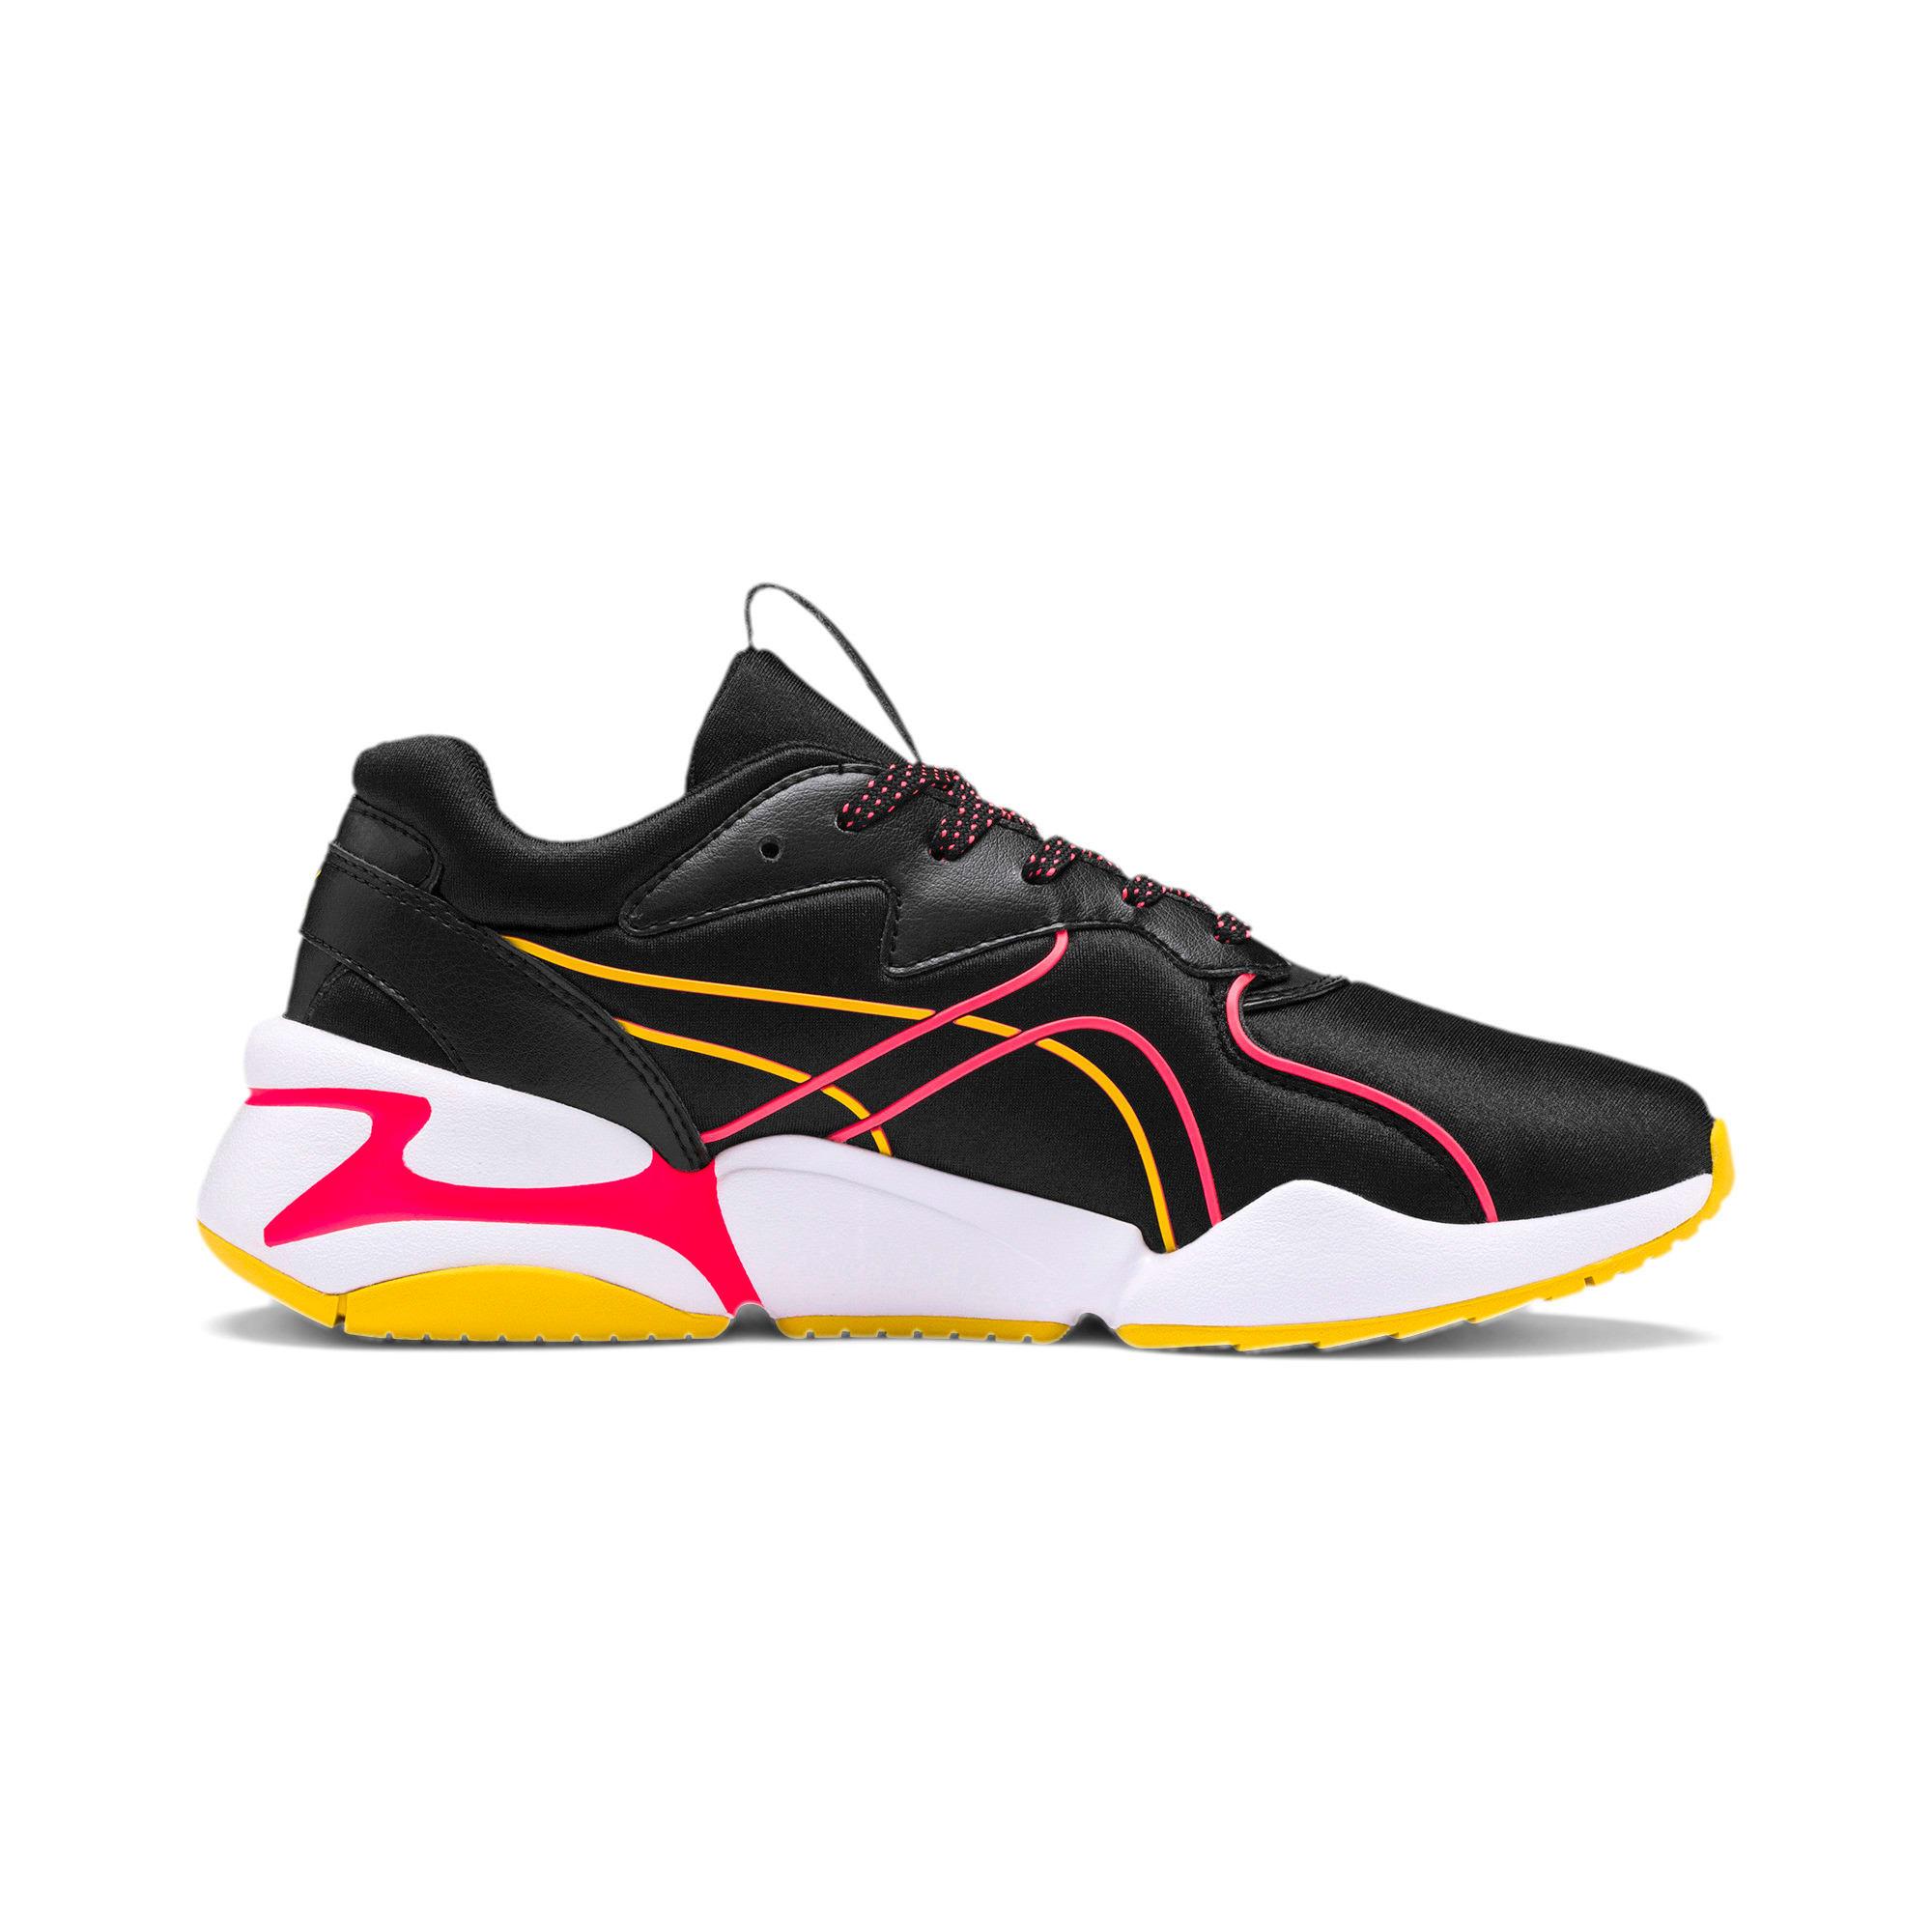 Thumbnail 6 of Nova Hypertech IMEVA sportschoenen voor dames, Puma Black, medium